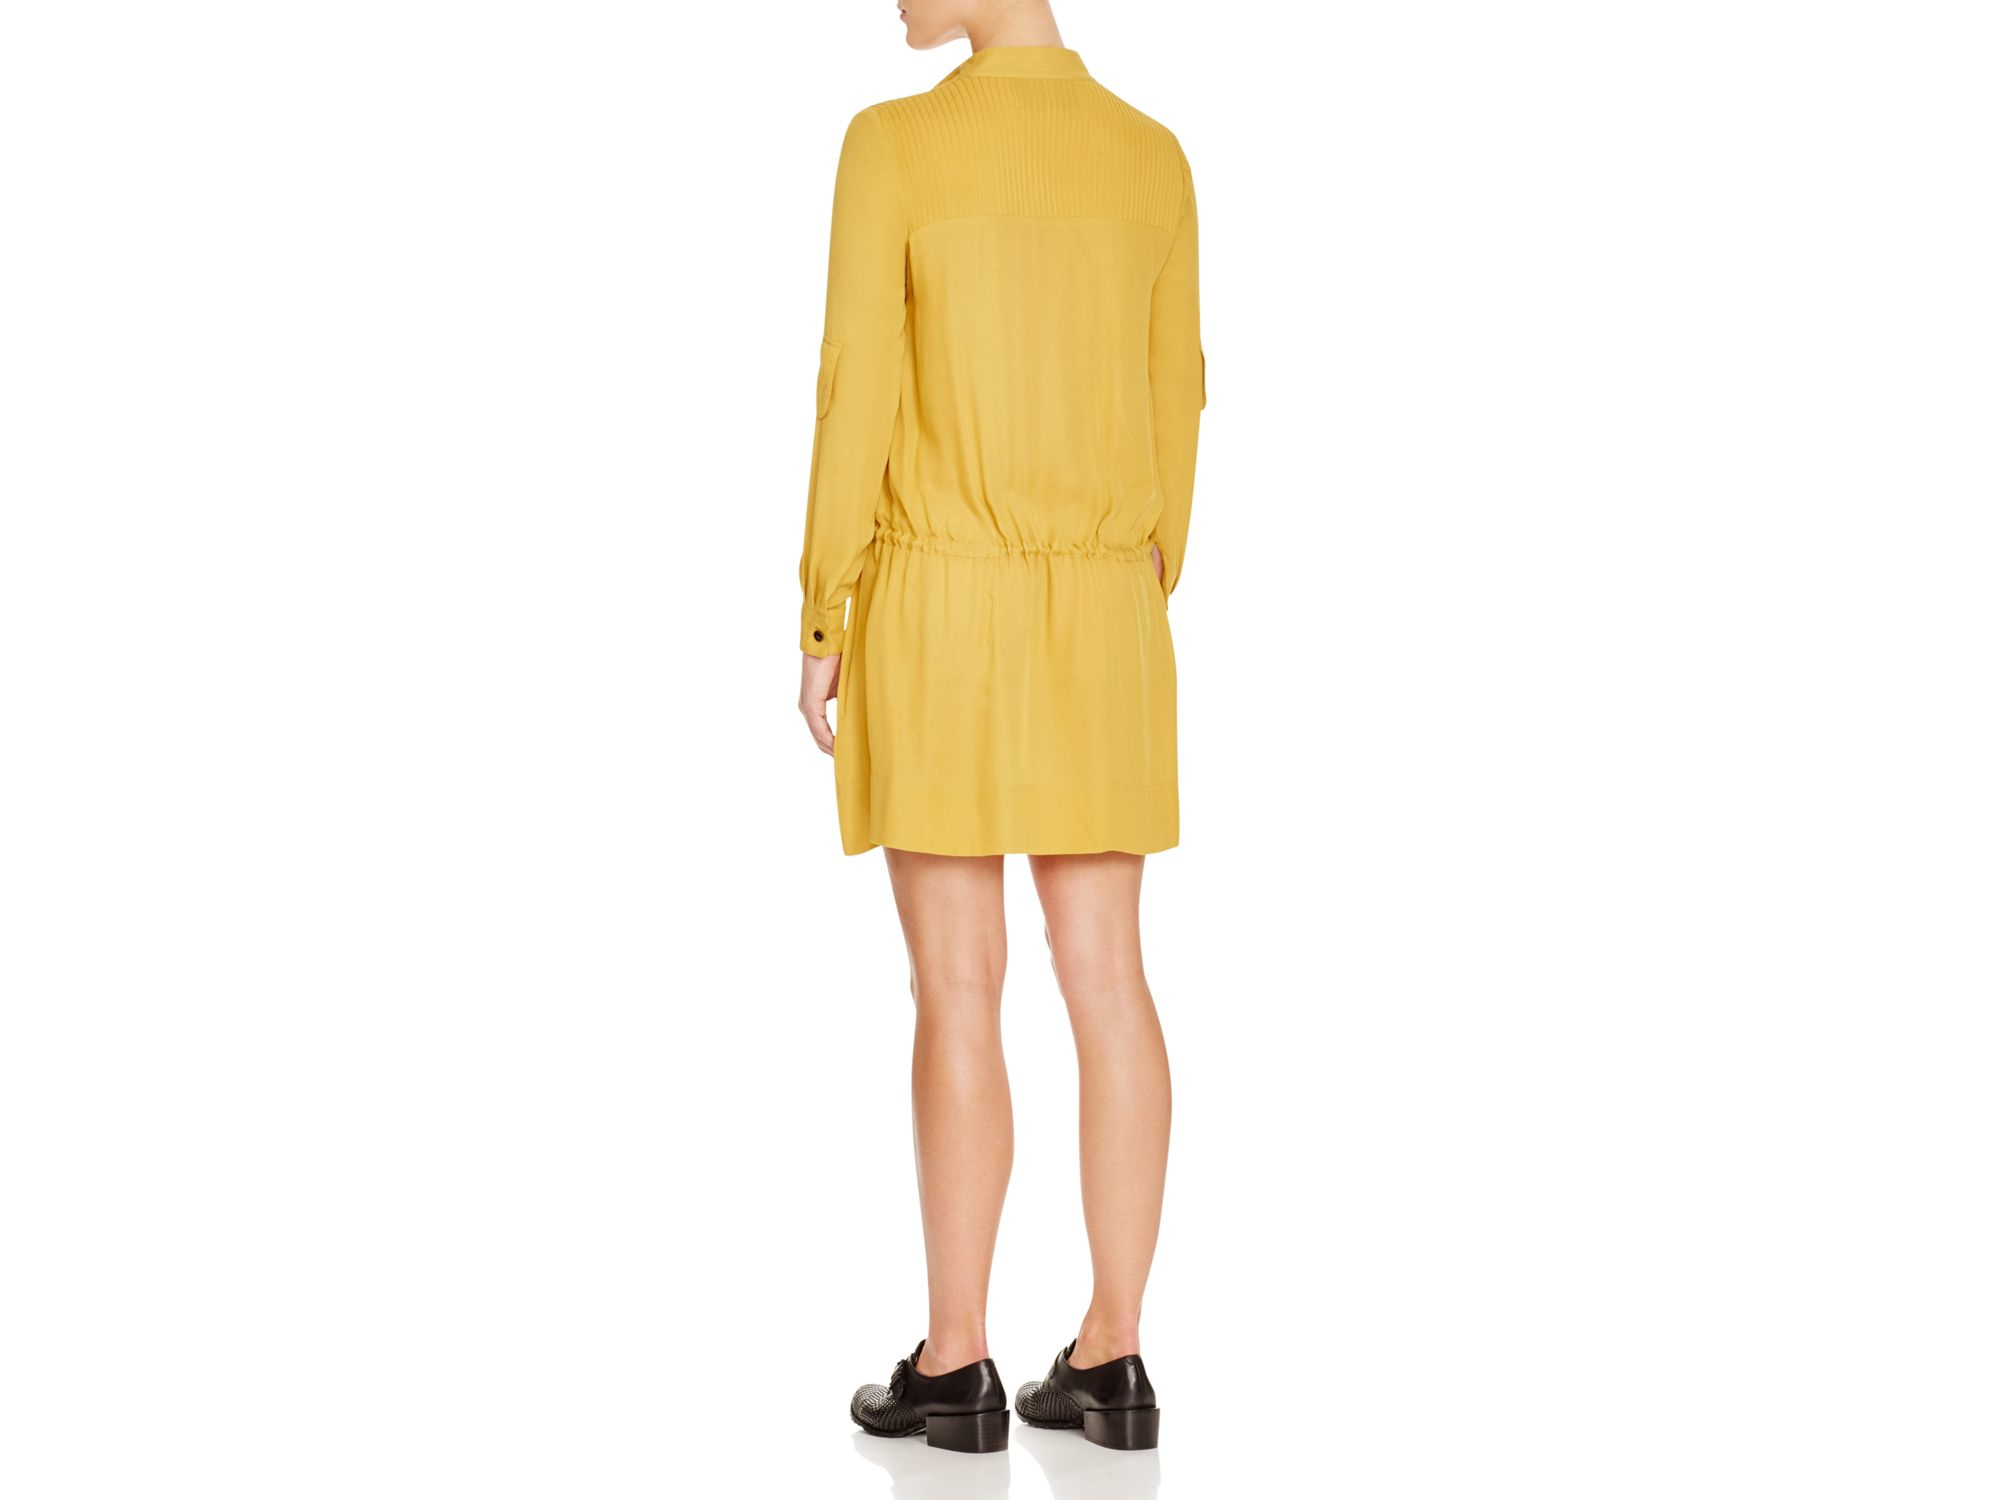 b251e4d2fa45a HANLEY Pintuck Silk Drawstring Shirt Dress in Yellow - Lyst